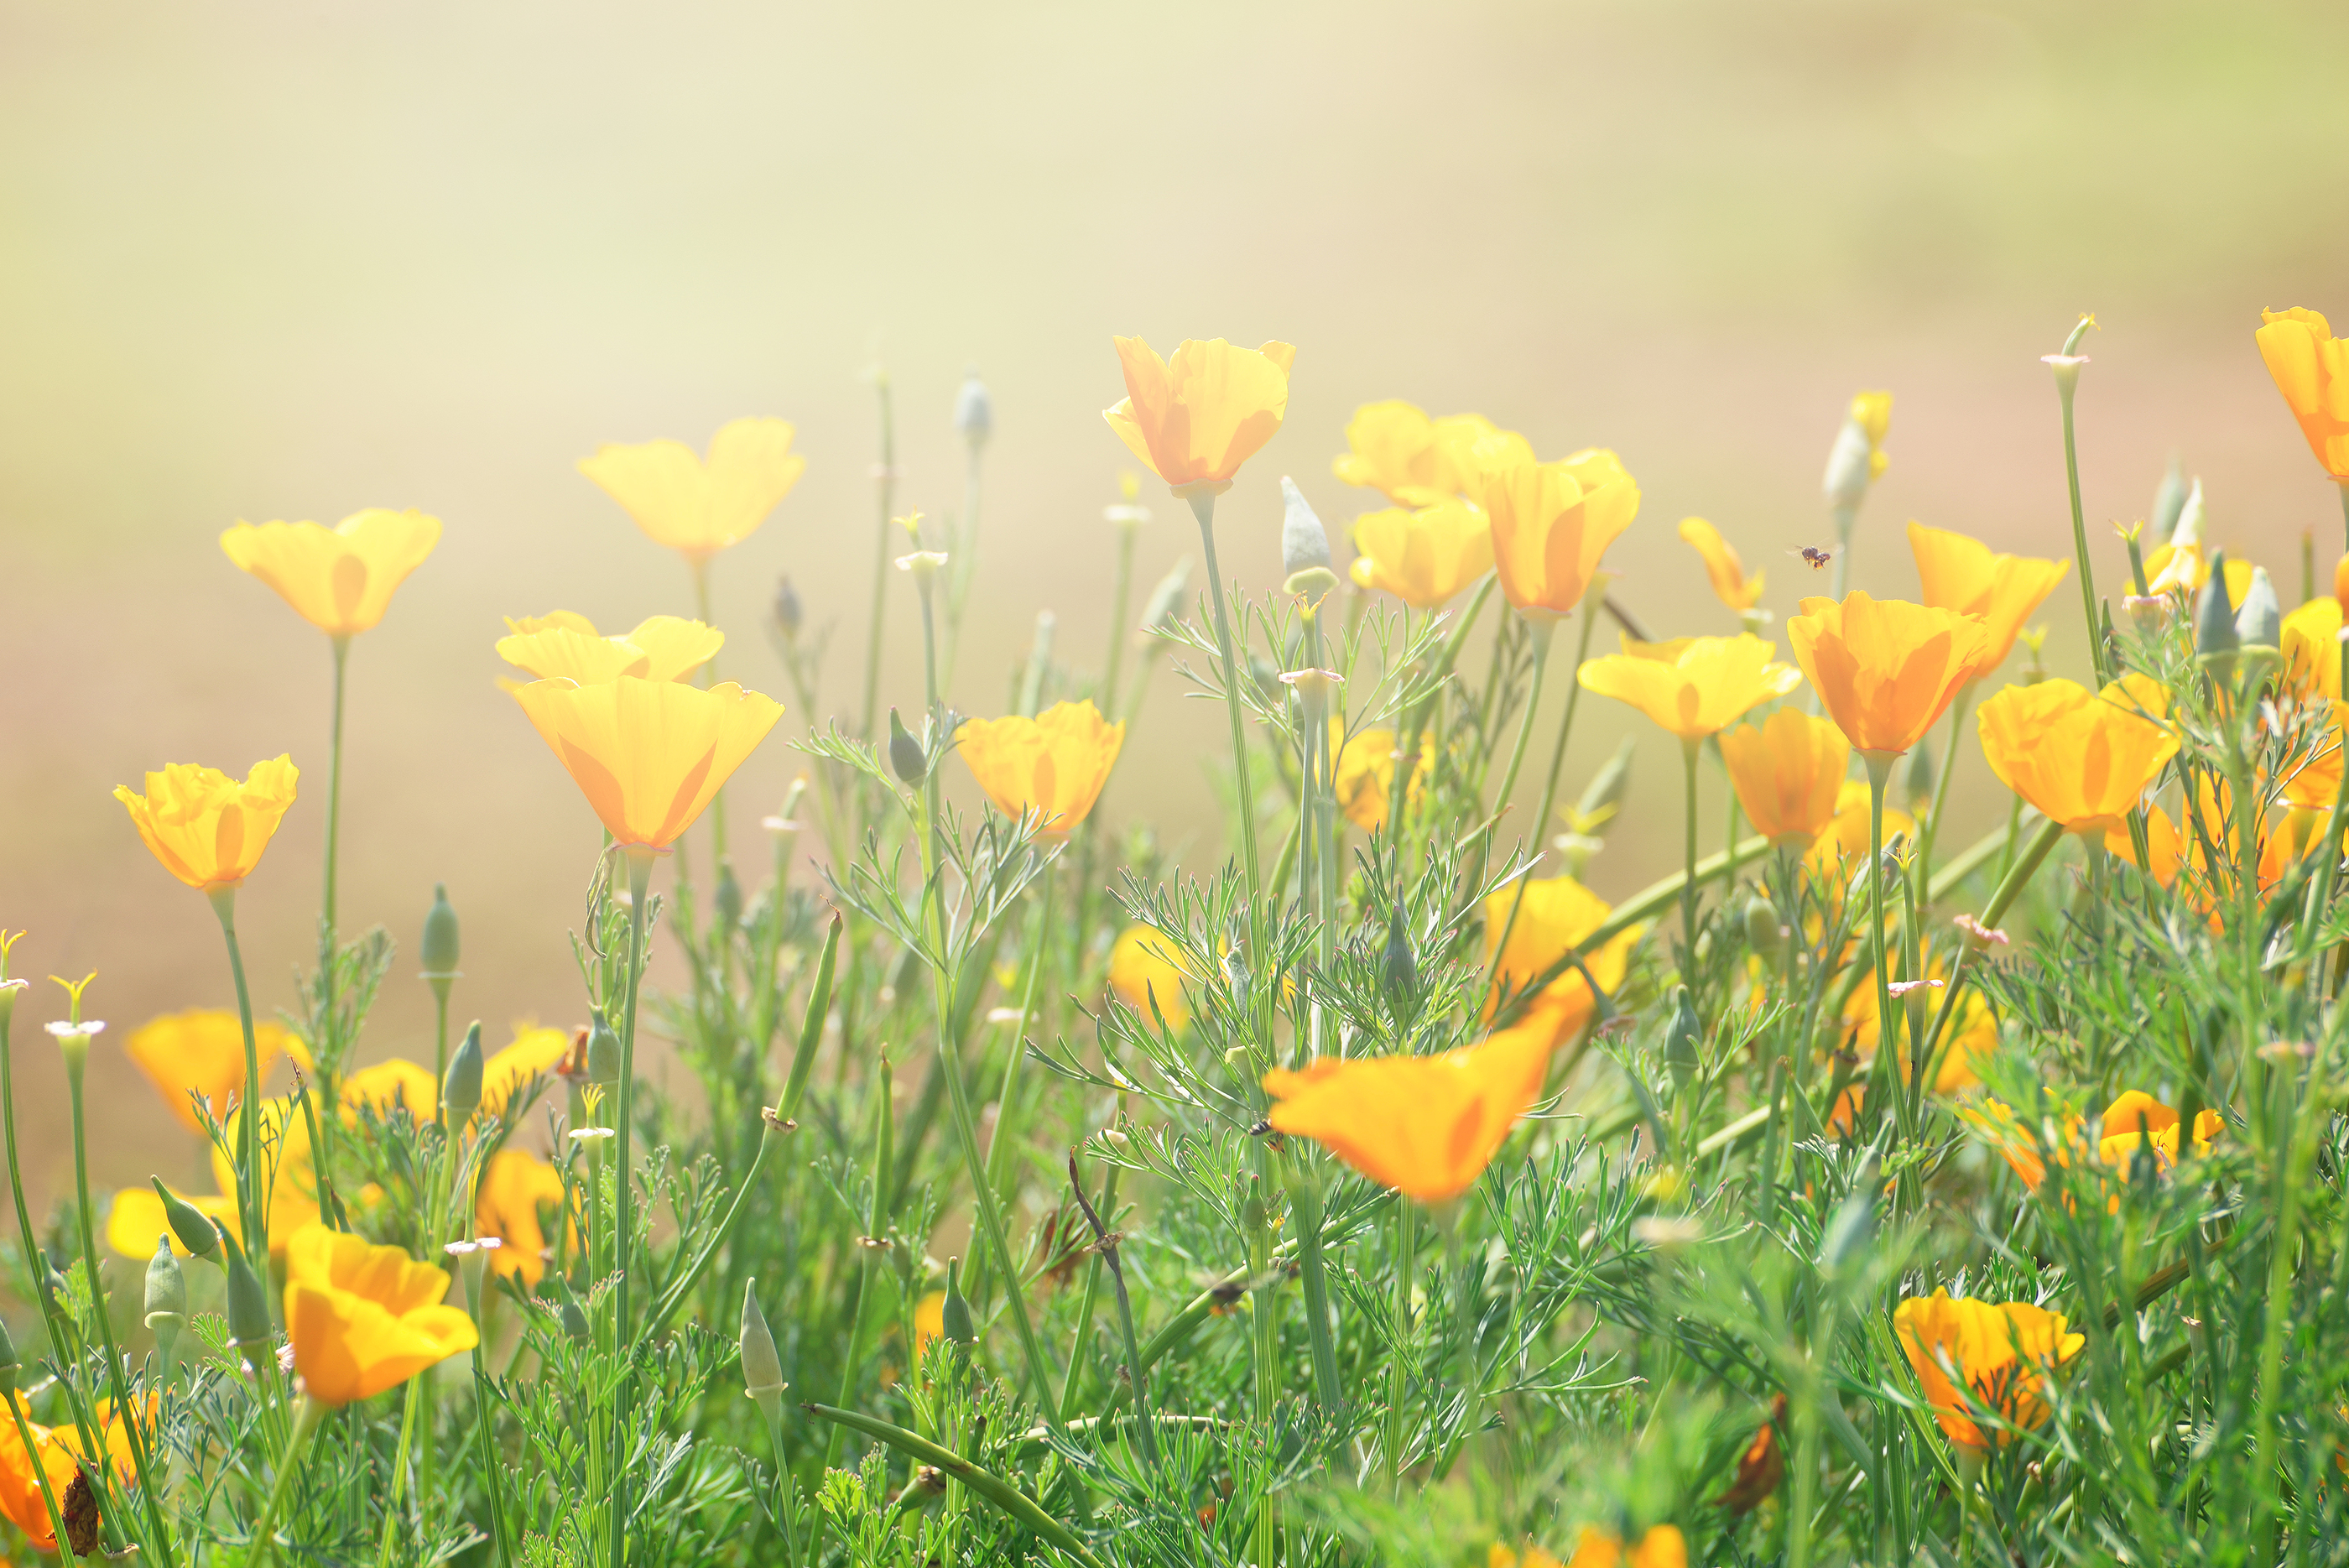 Close-up Of California Golden Poppy Flowers, Yellow Flowers Summer Spring Garden